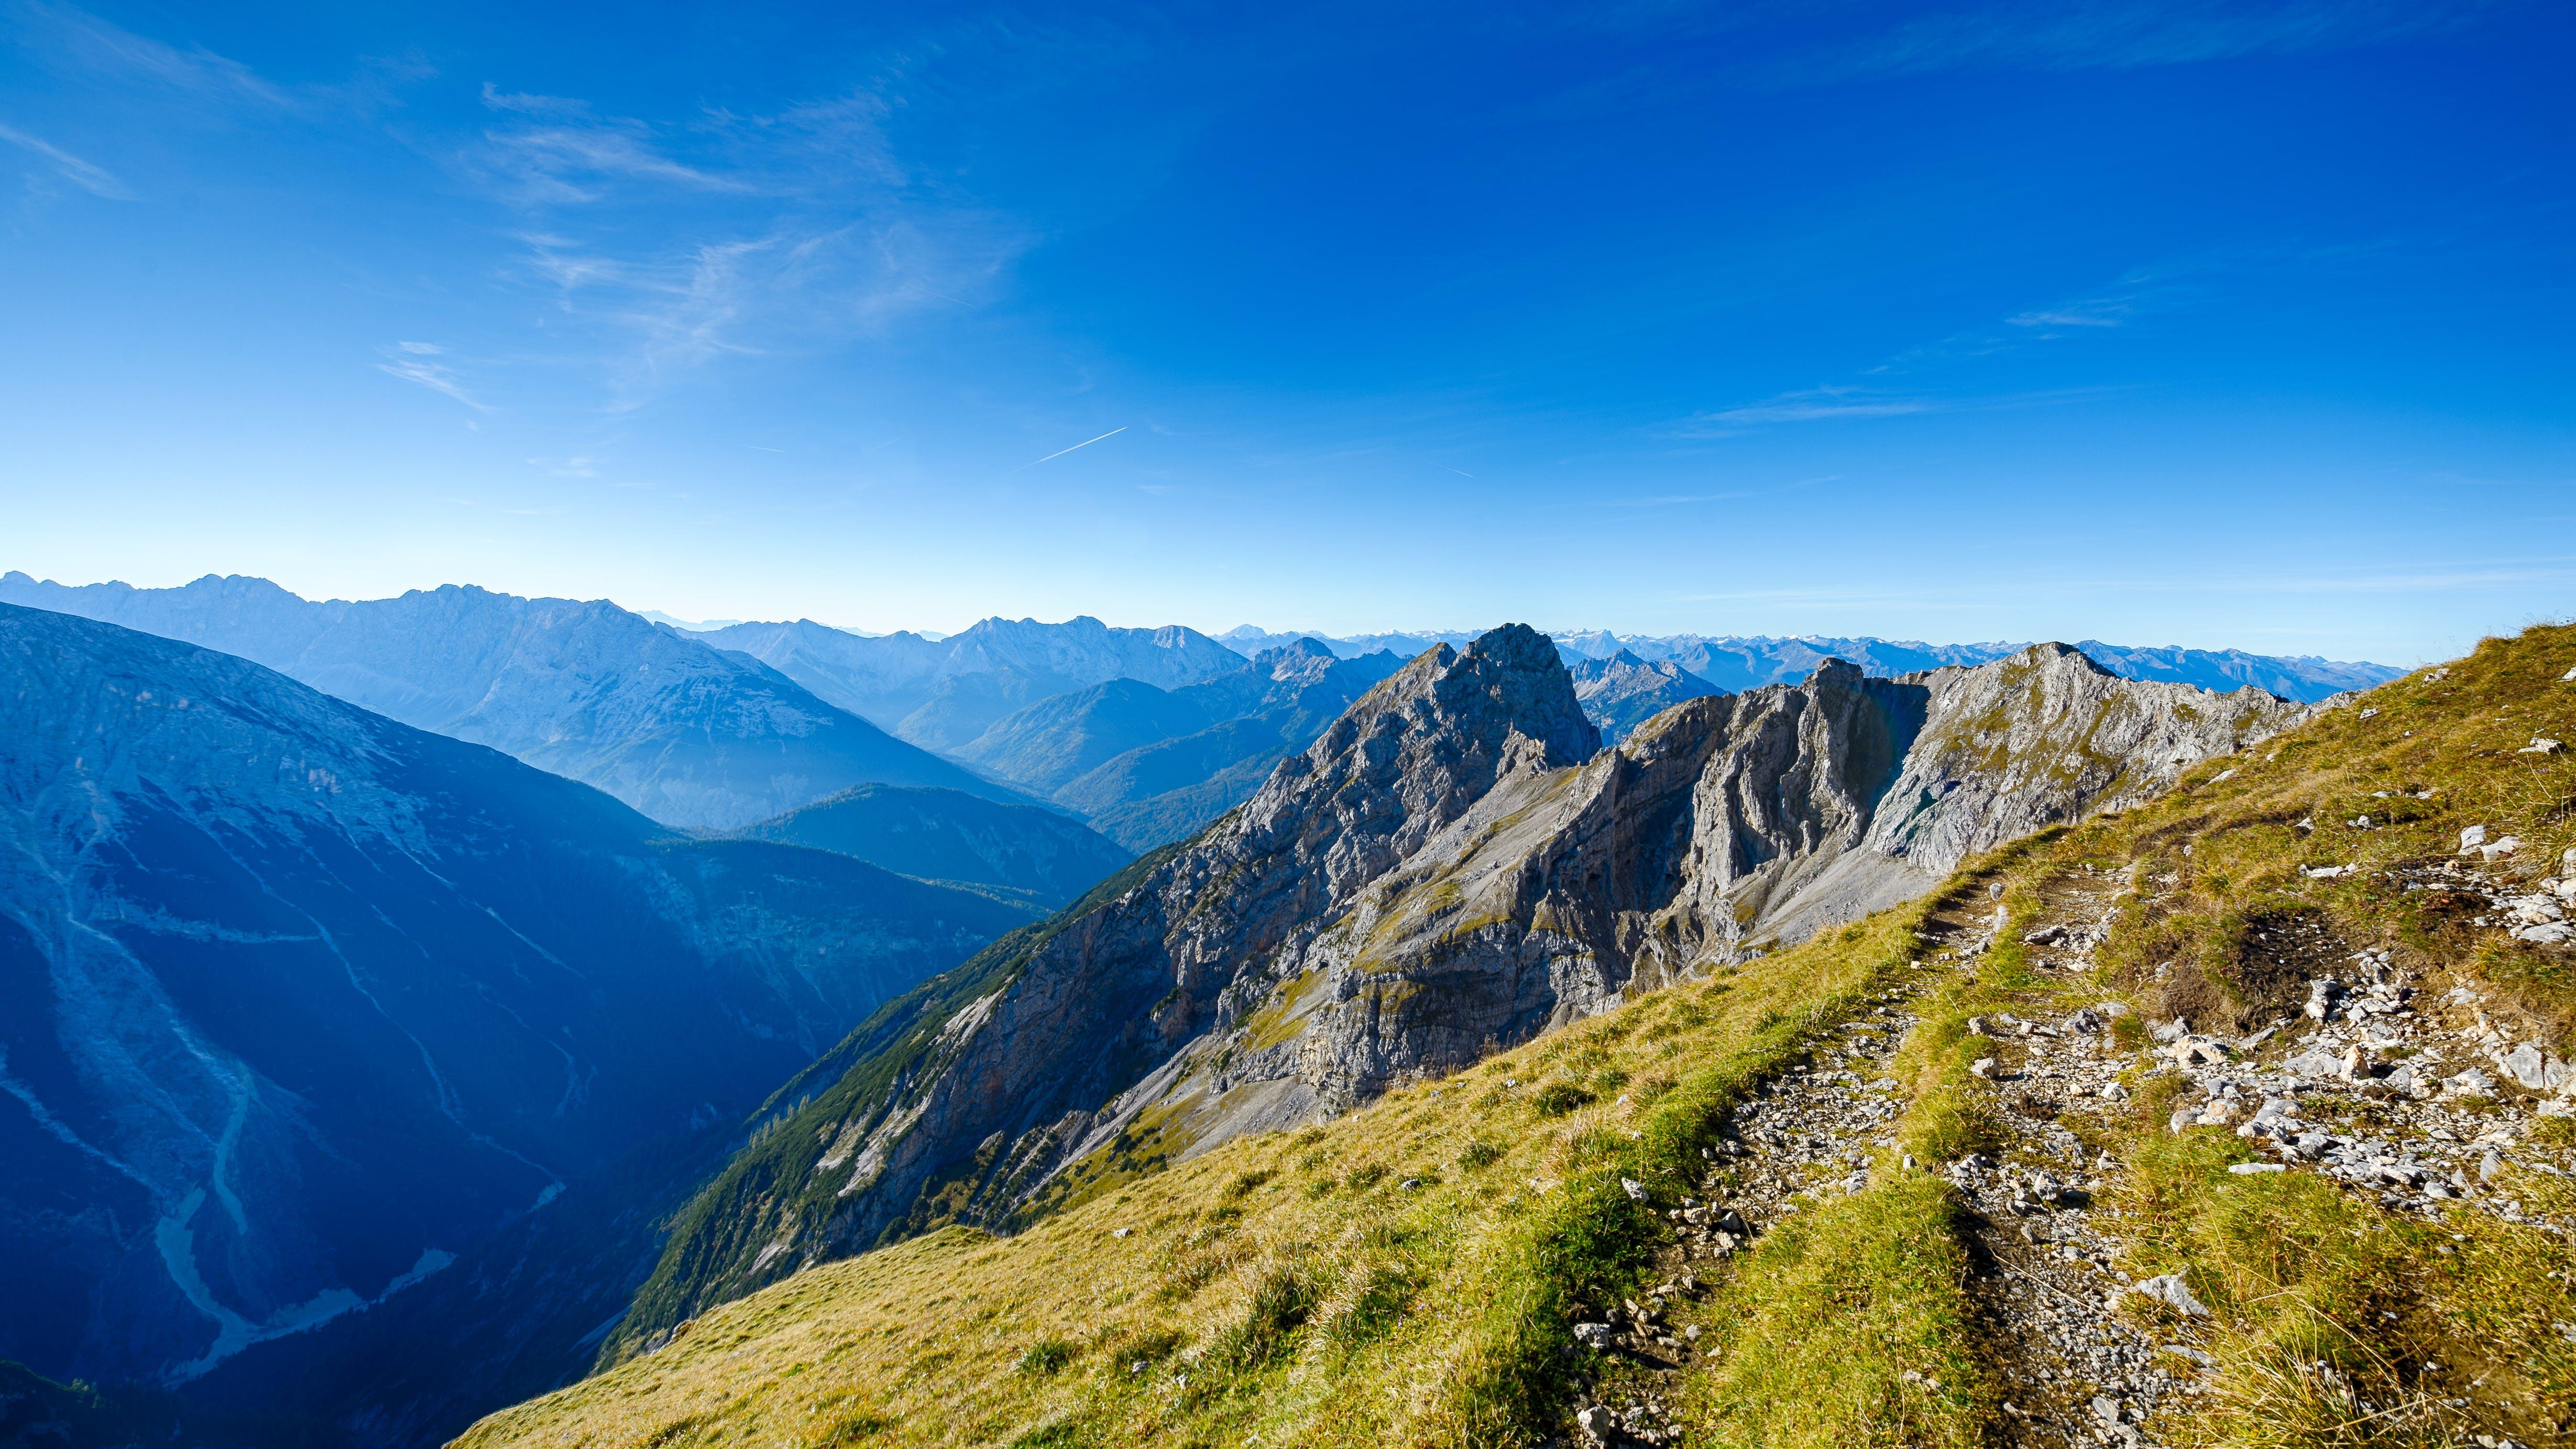 4k-baggrund, bjerge, bjergtinde